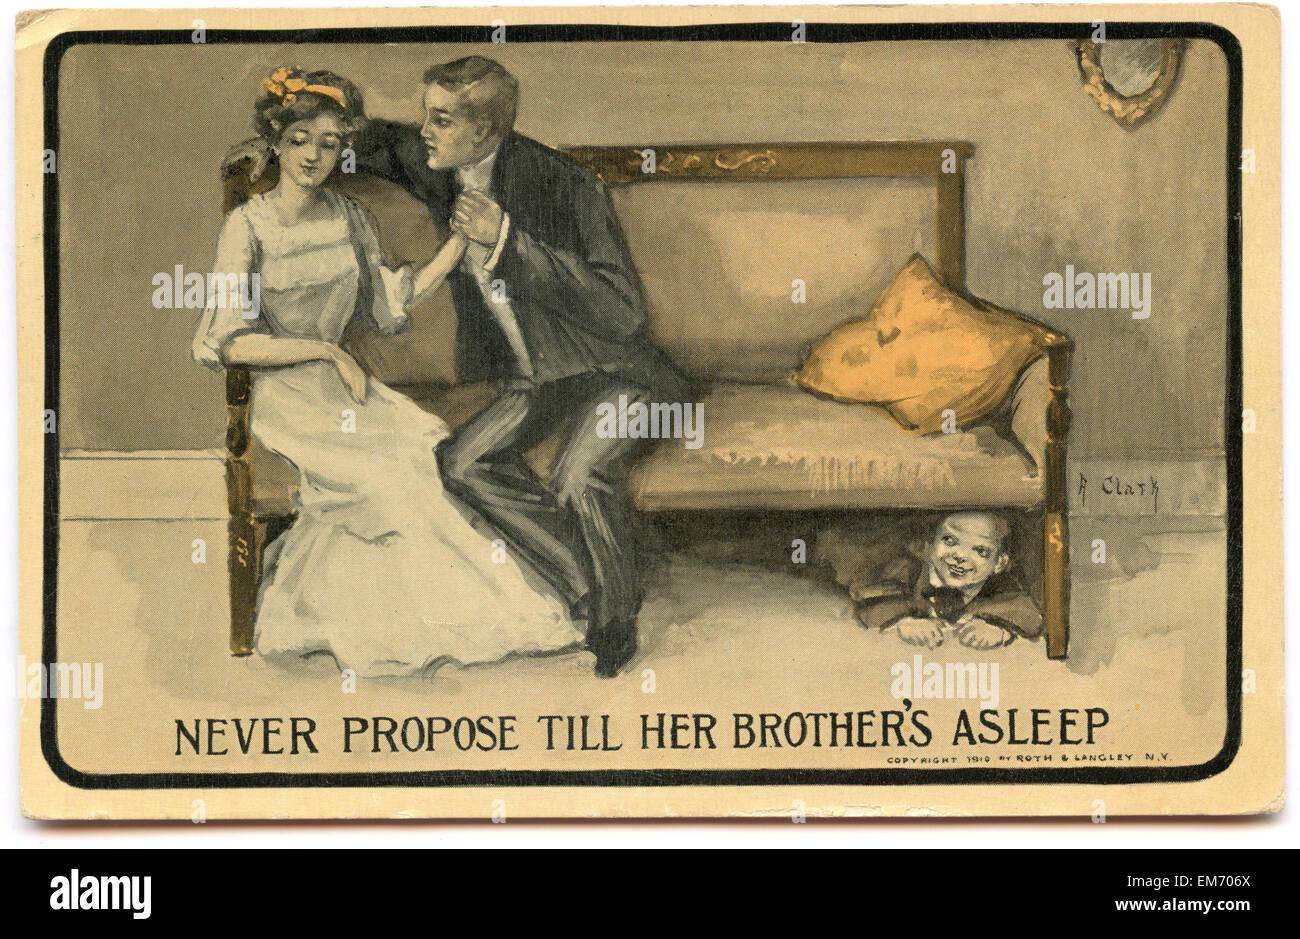 Vintage postcard of marriage proposal - Stock Image